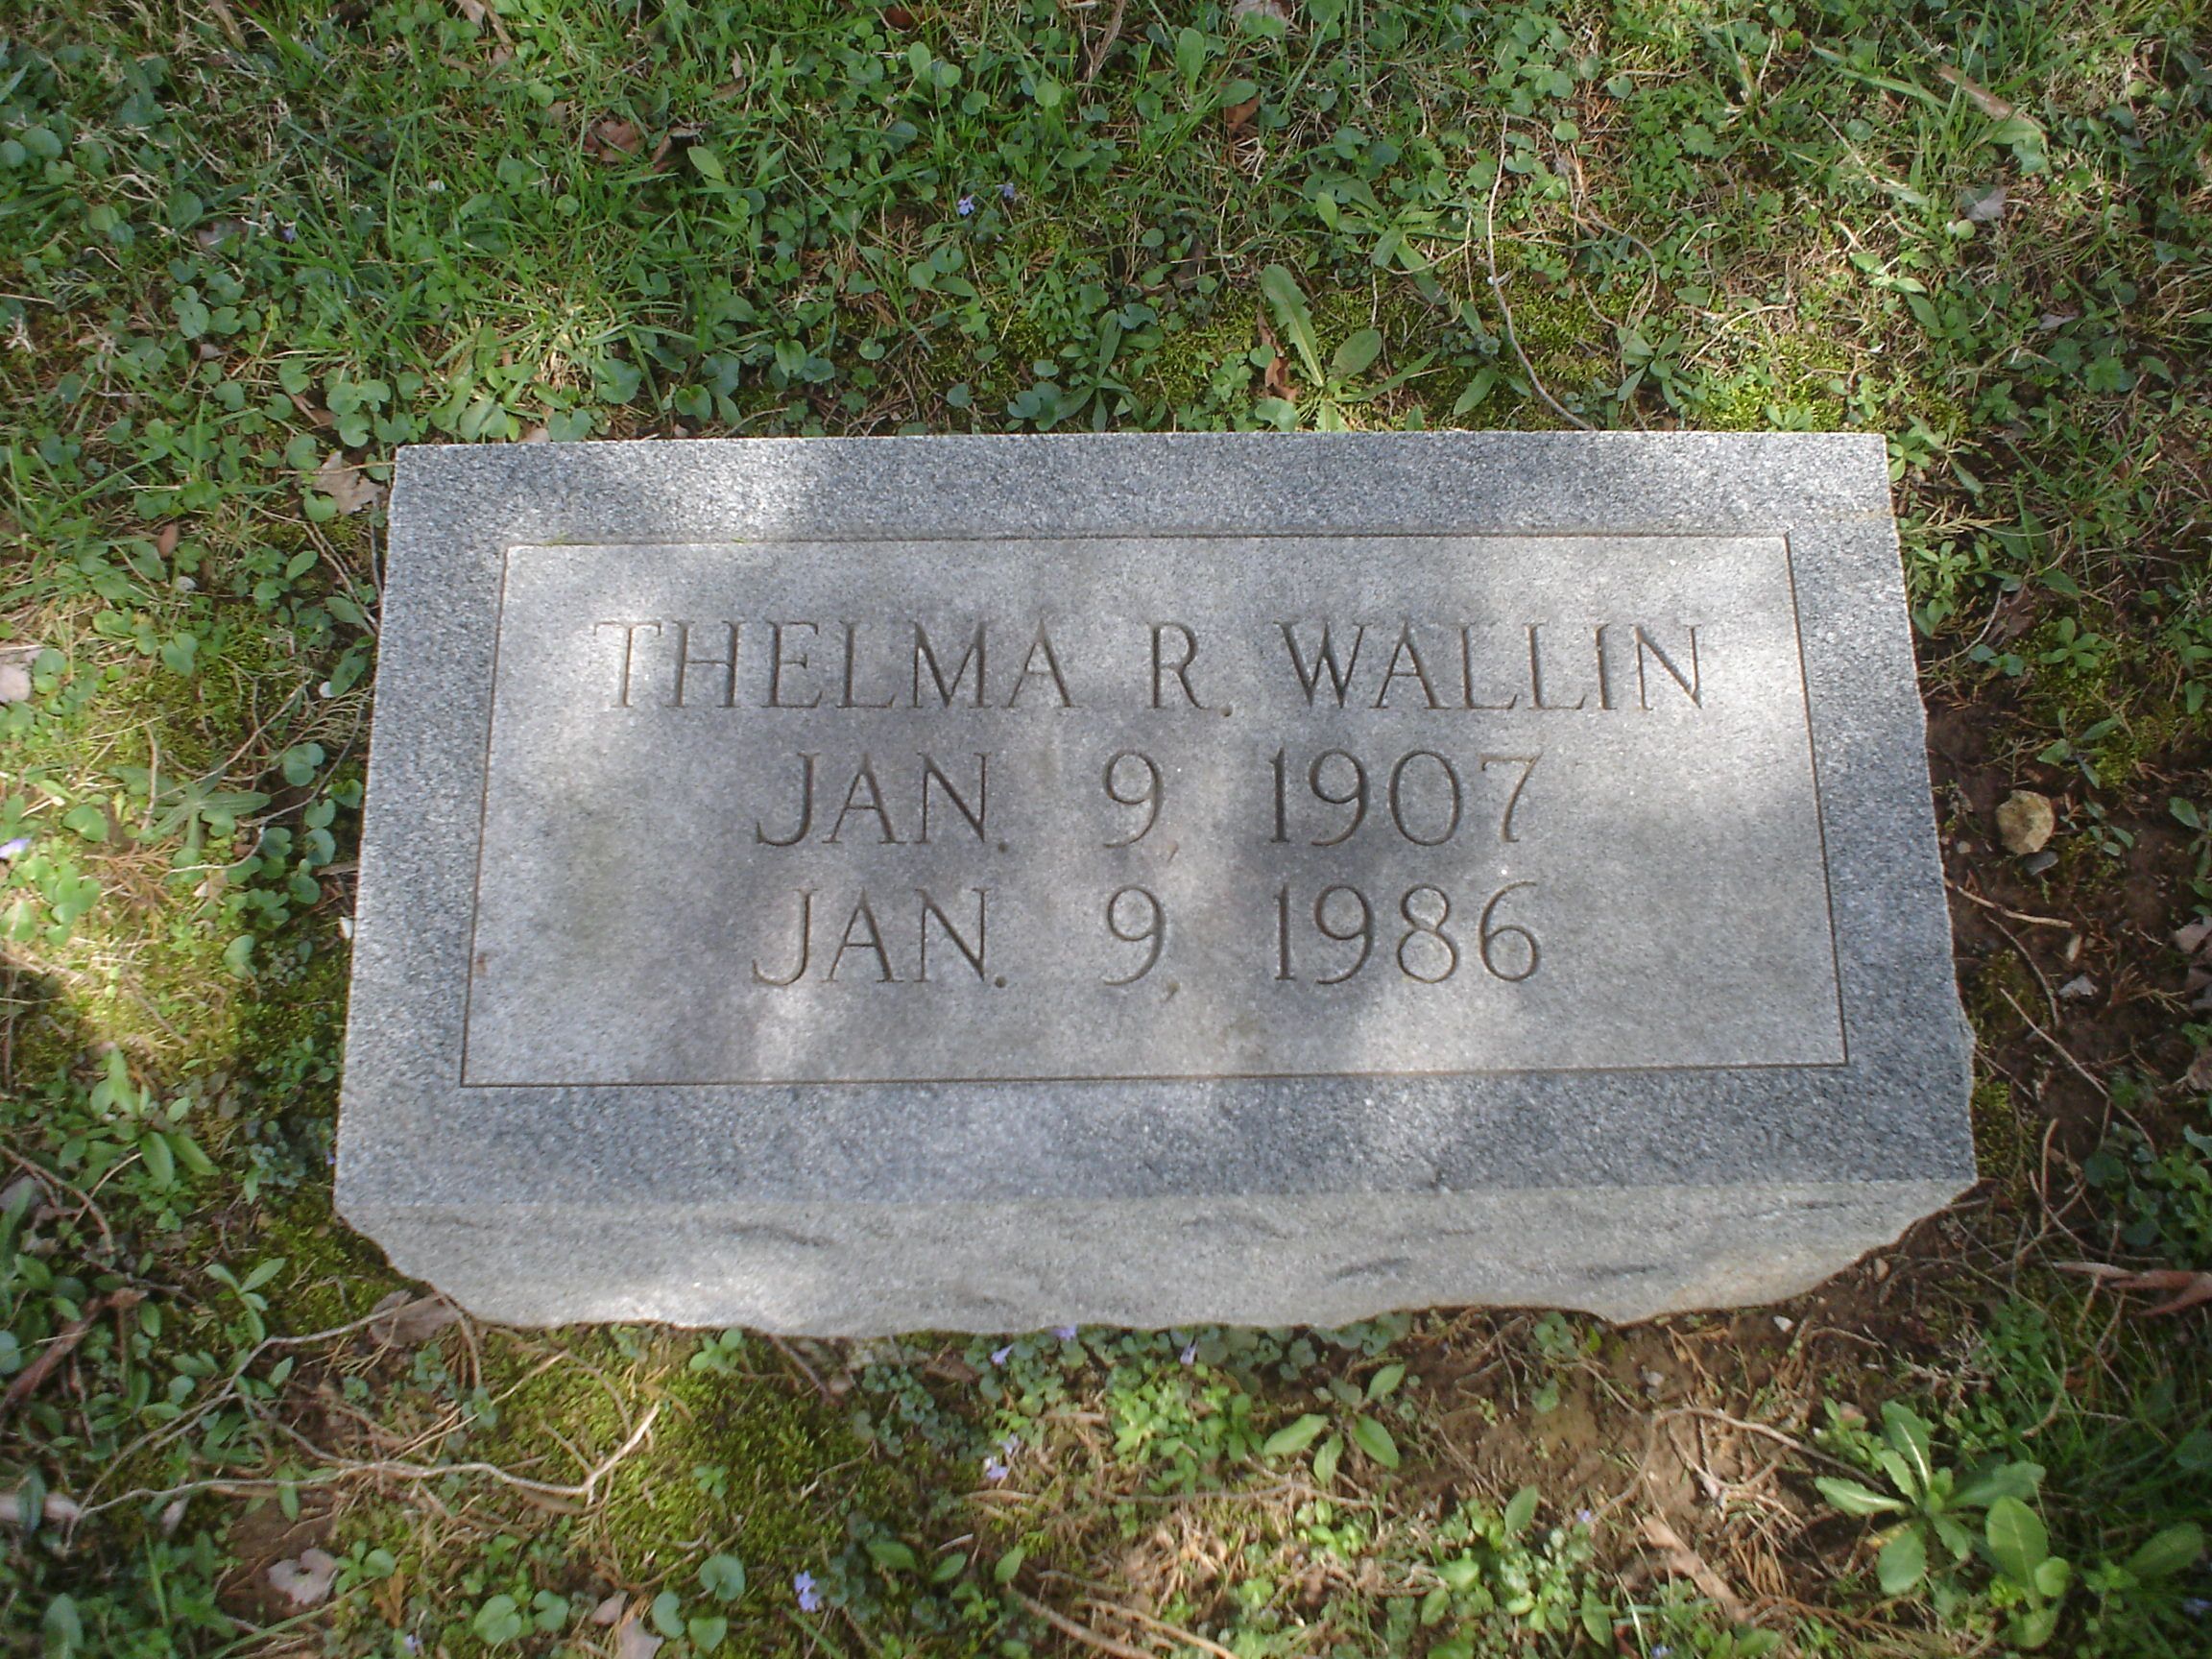 Thelma R. Wallin